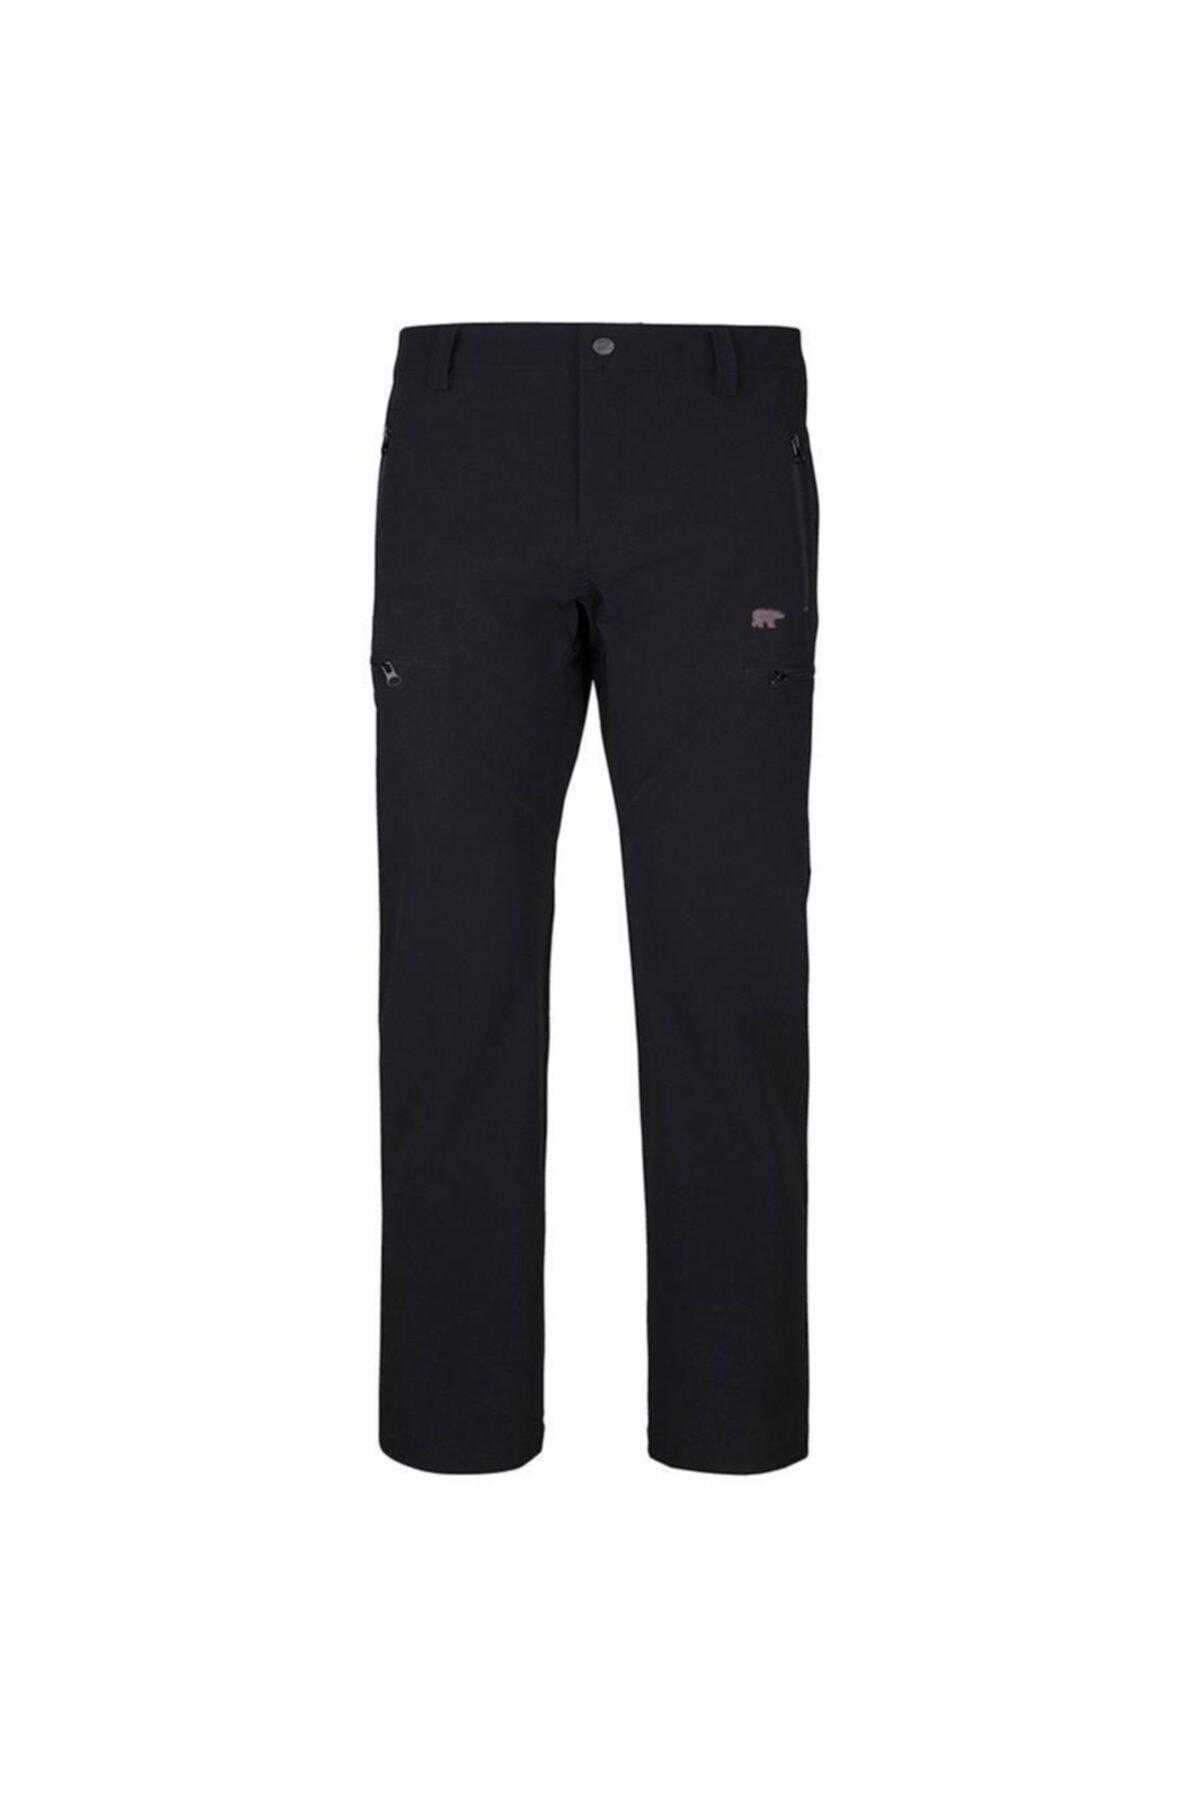 Bad Bear Erkek Spor Pantolon 20.02.16.007 1